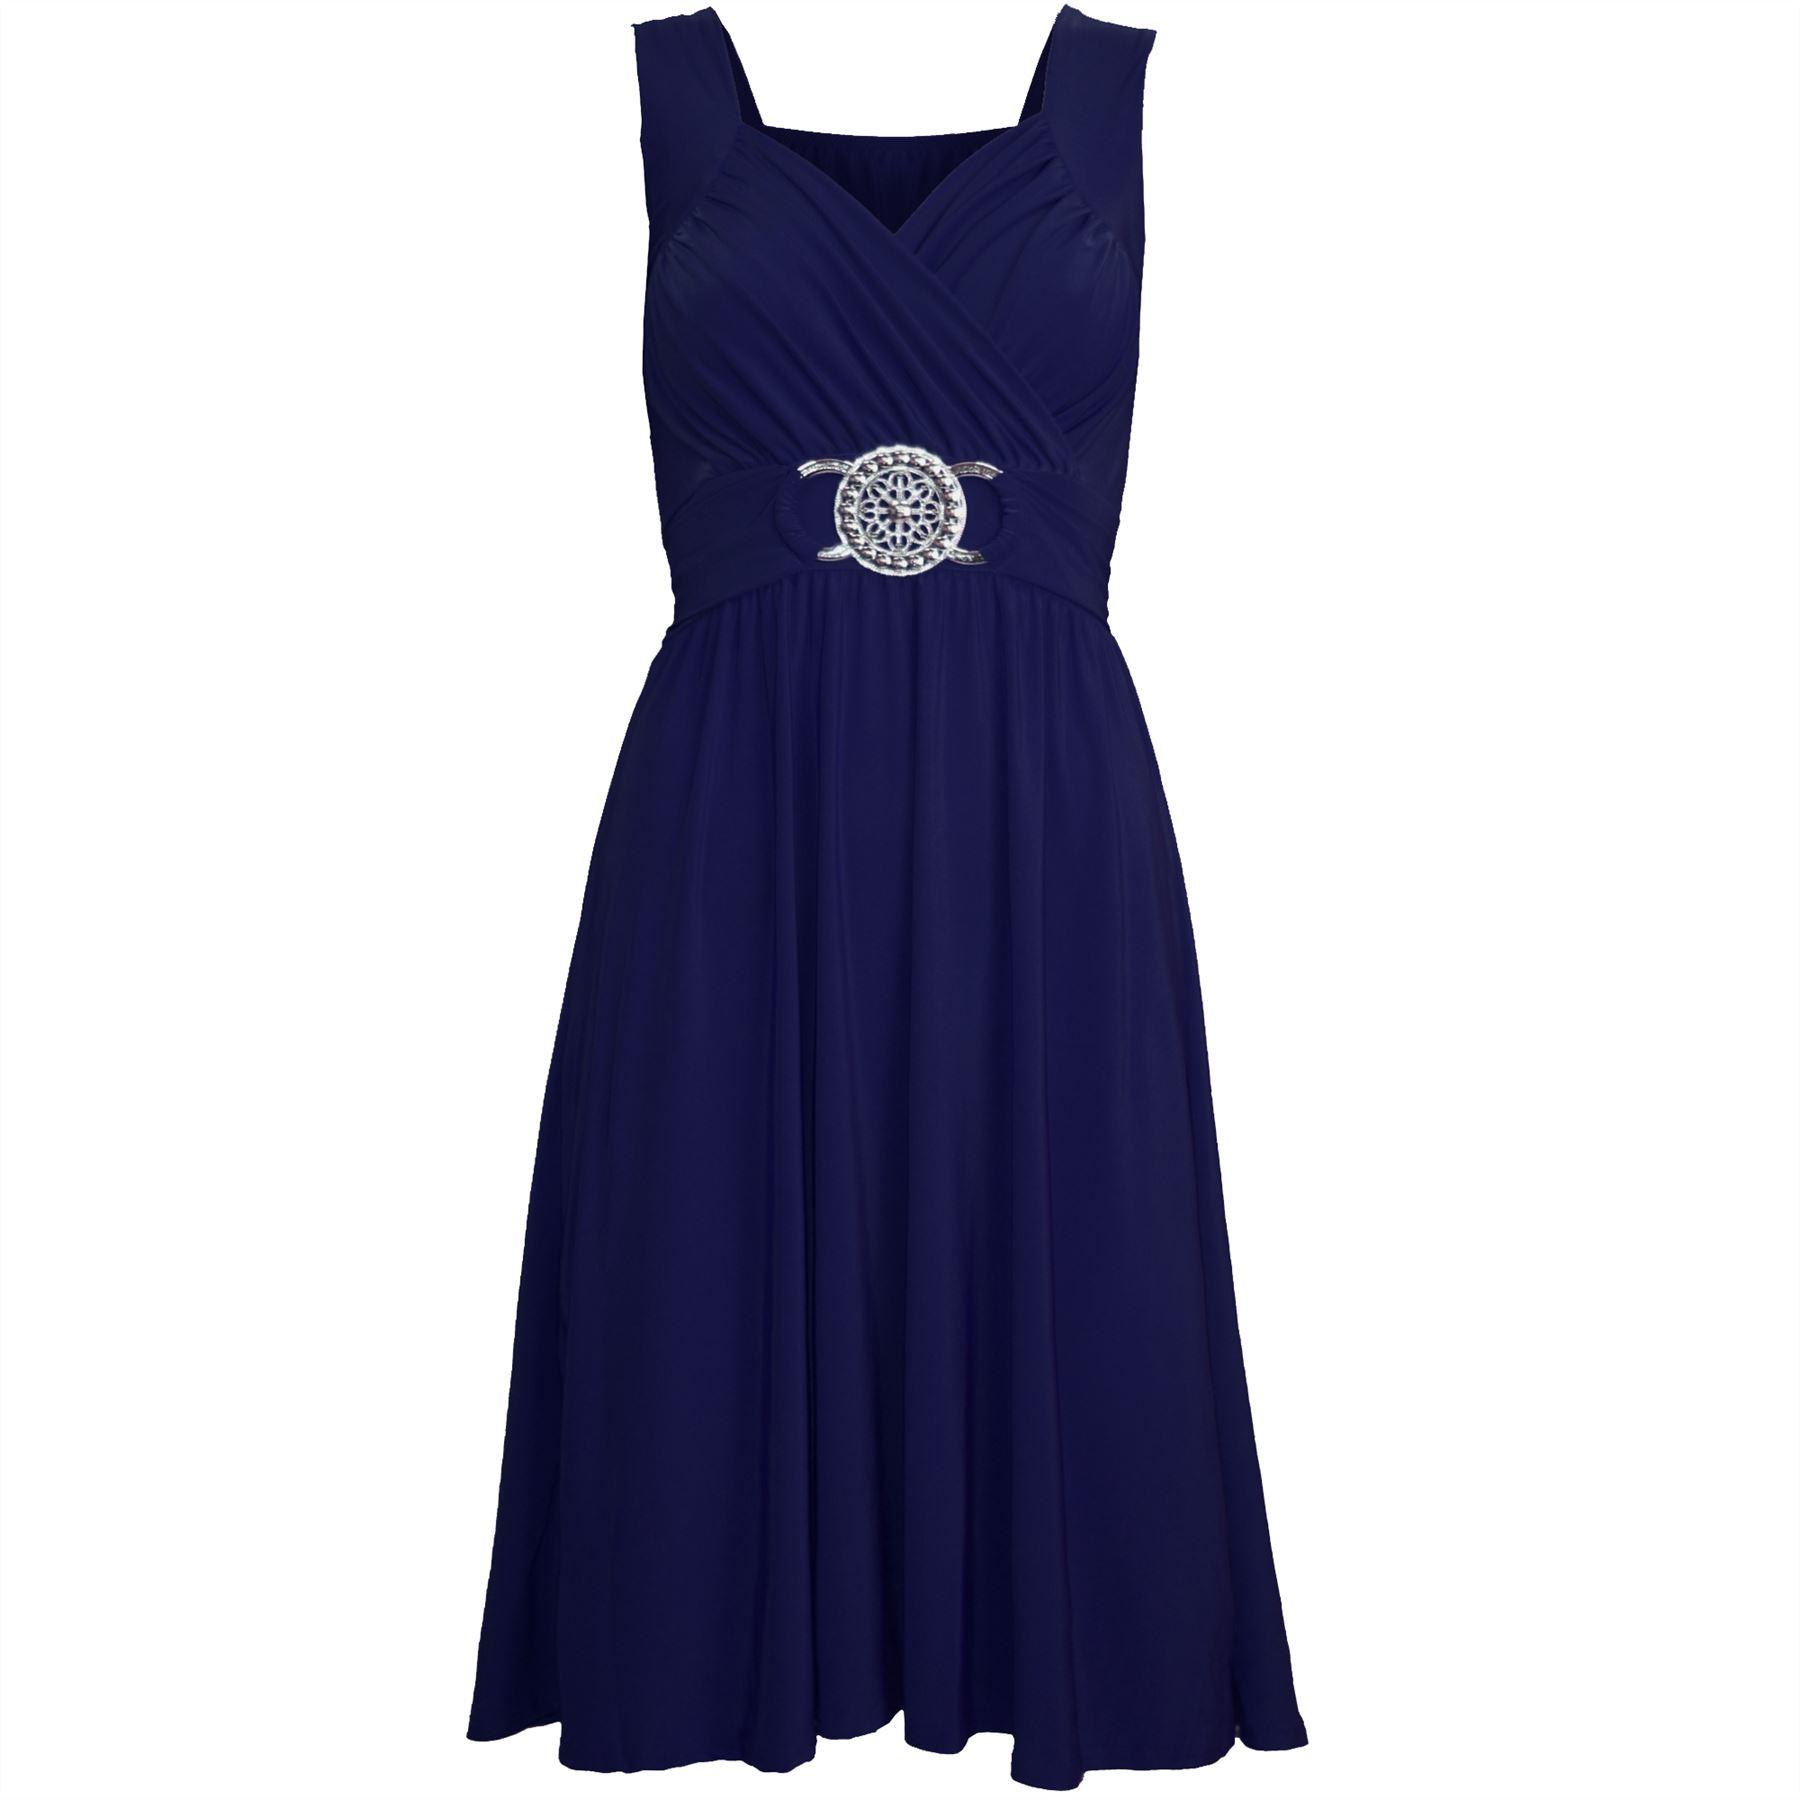 womens midi dress sleeveless wrapover silver badge